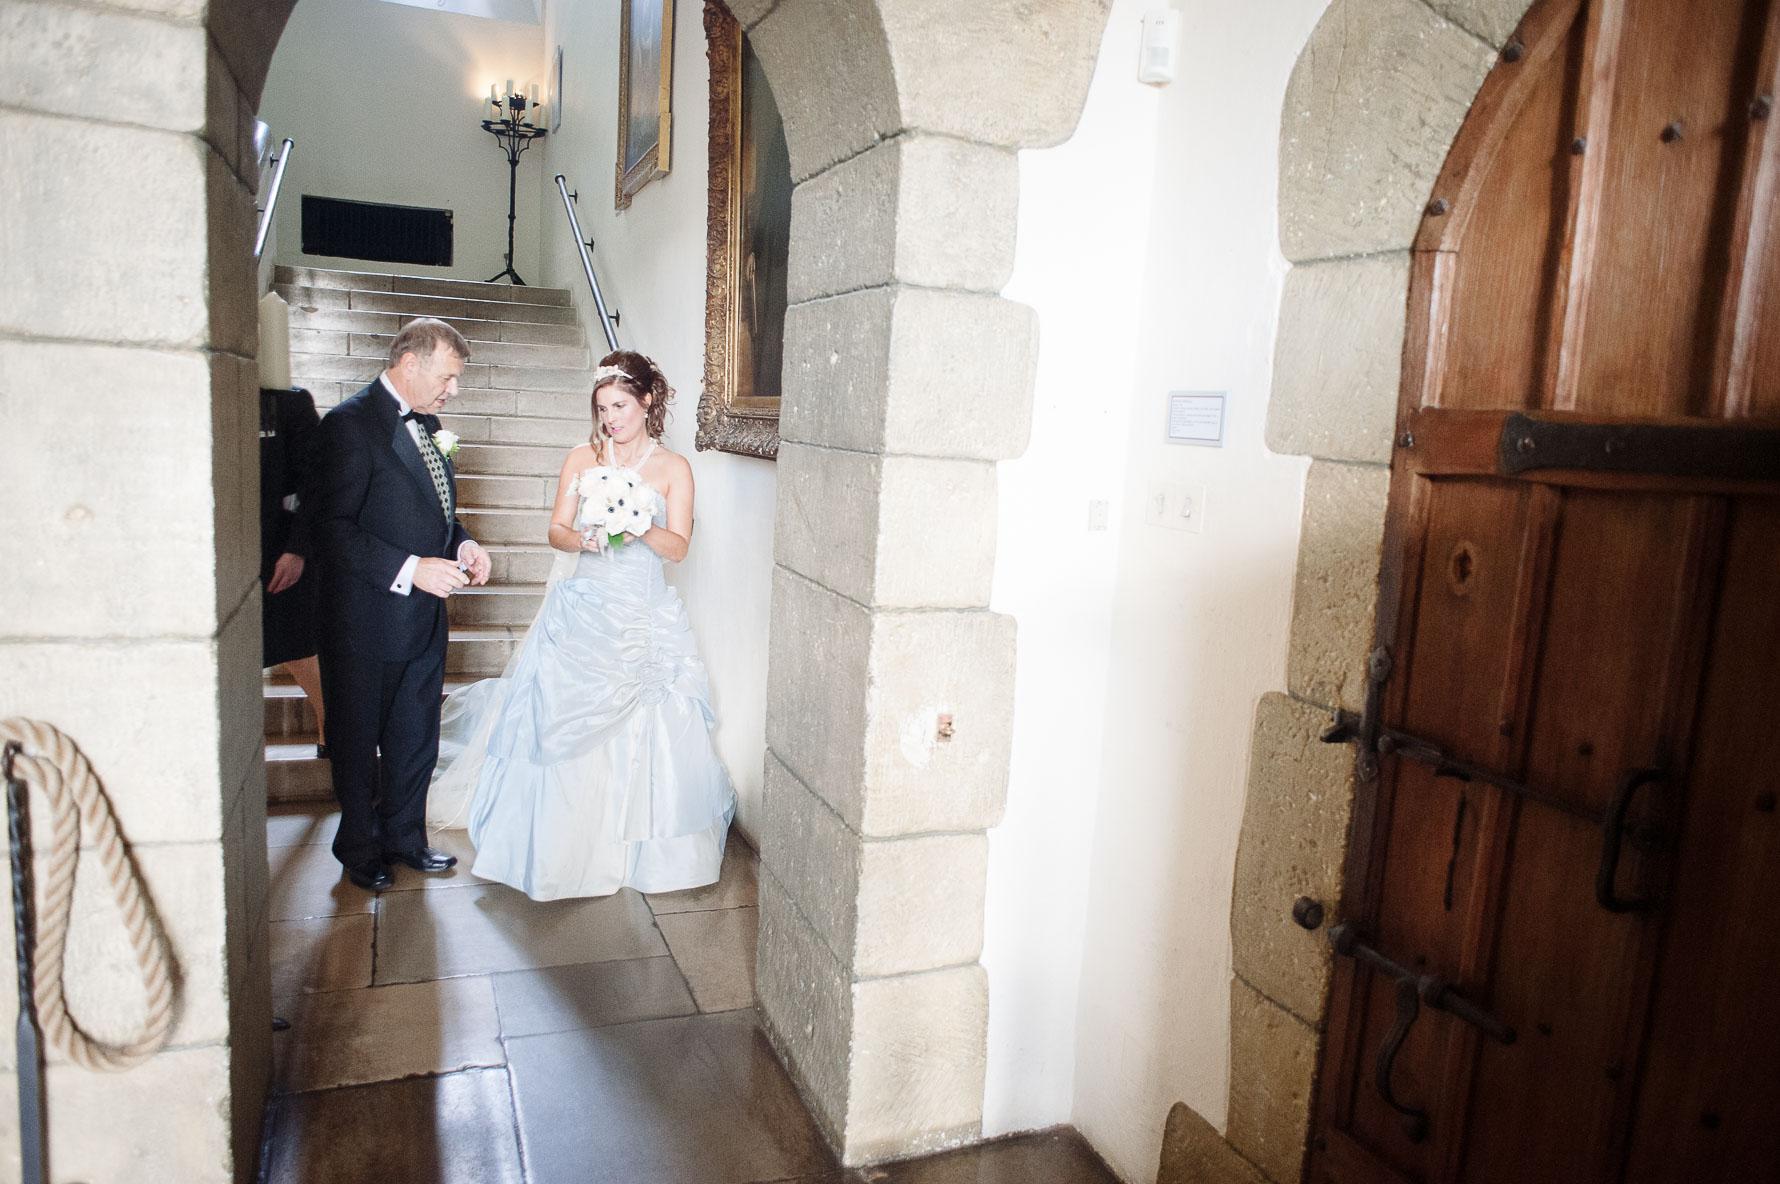 Leeds Castle Wedding11-20140919 0370